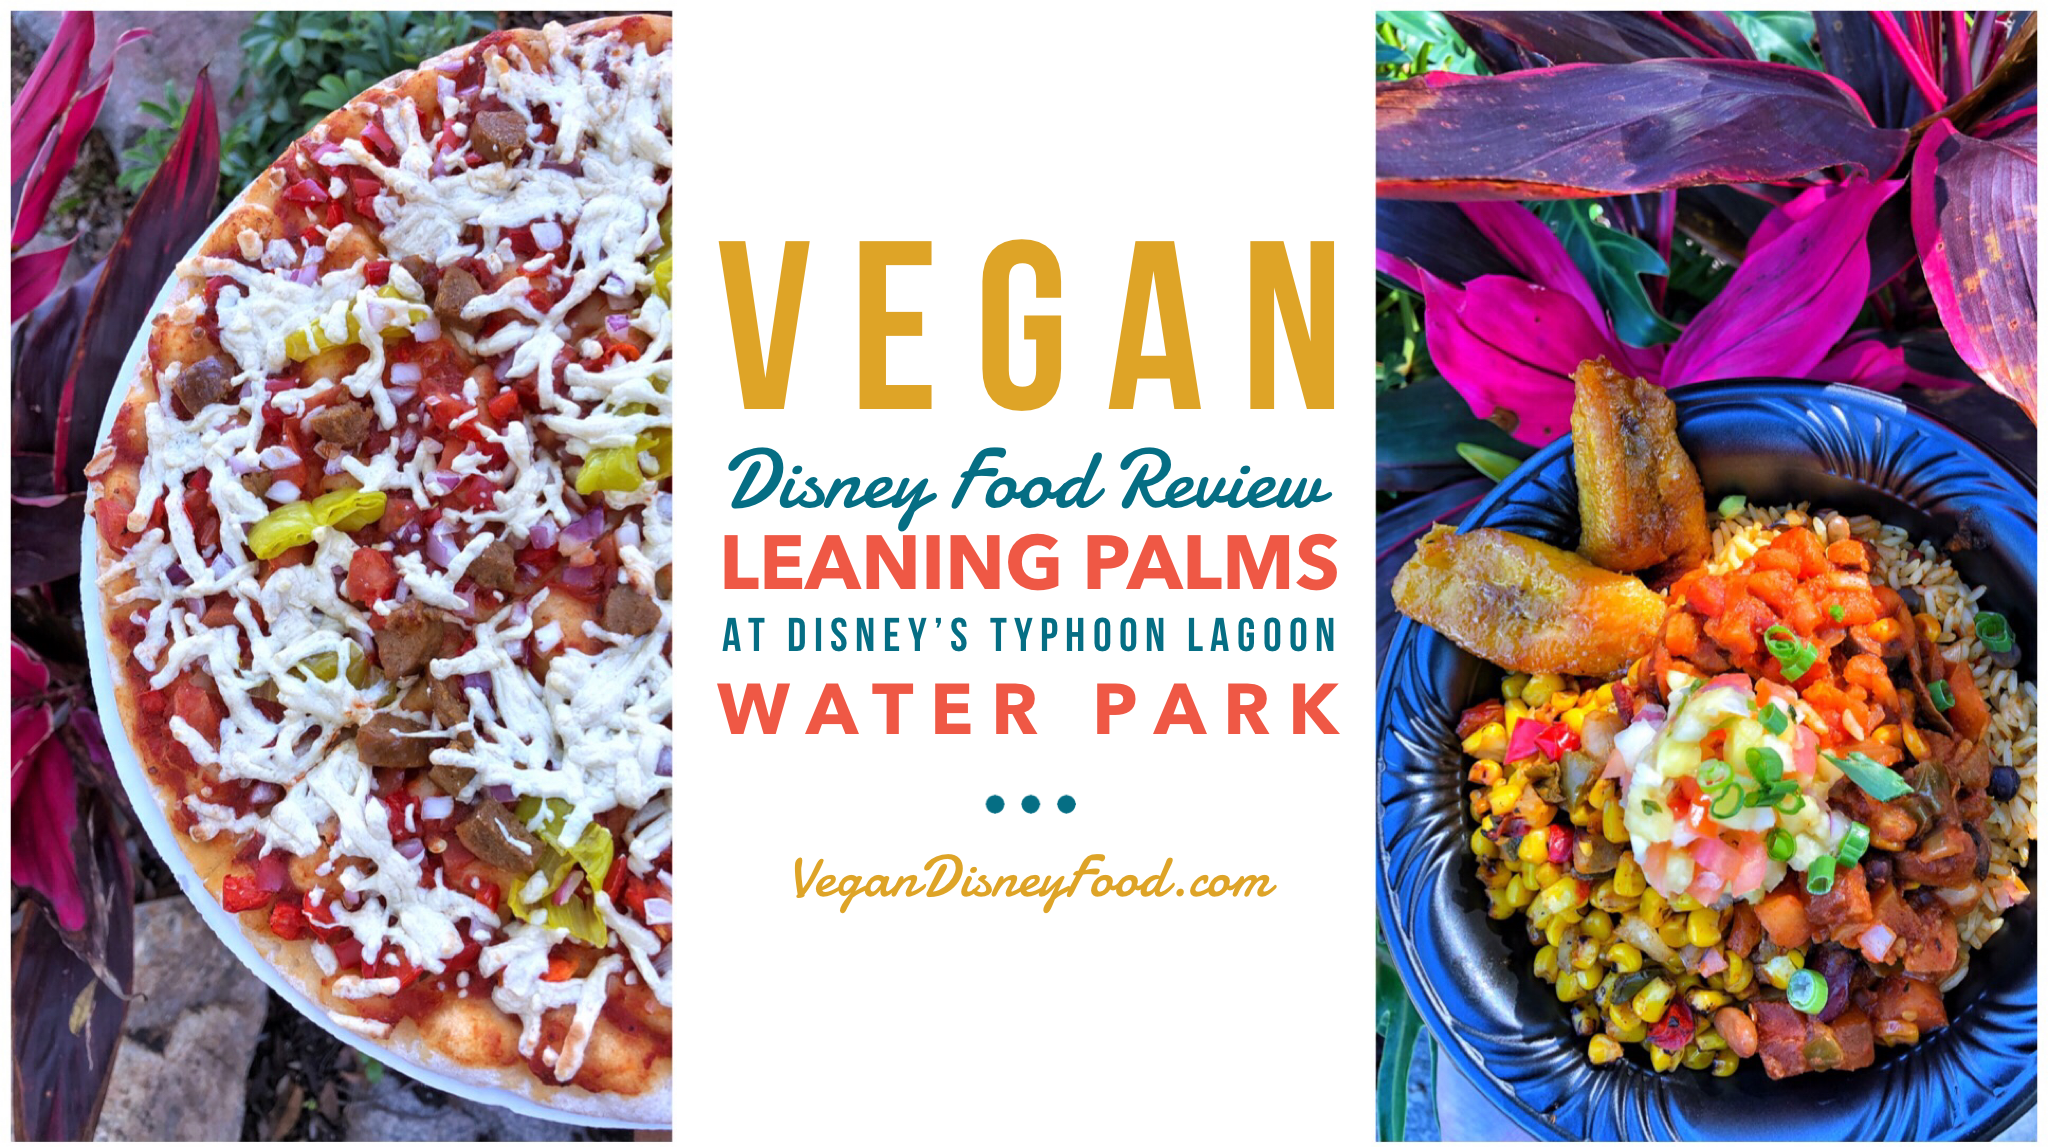 Vegan Disney Food Review: Leaning Palms at Disney's Typhoon Lagoon Water Park In Walt Disney World